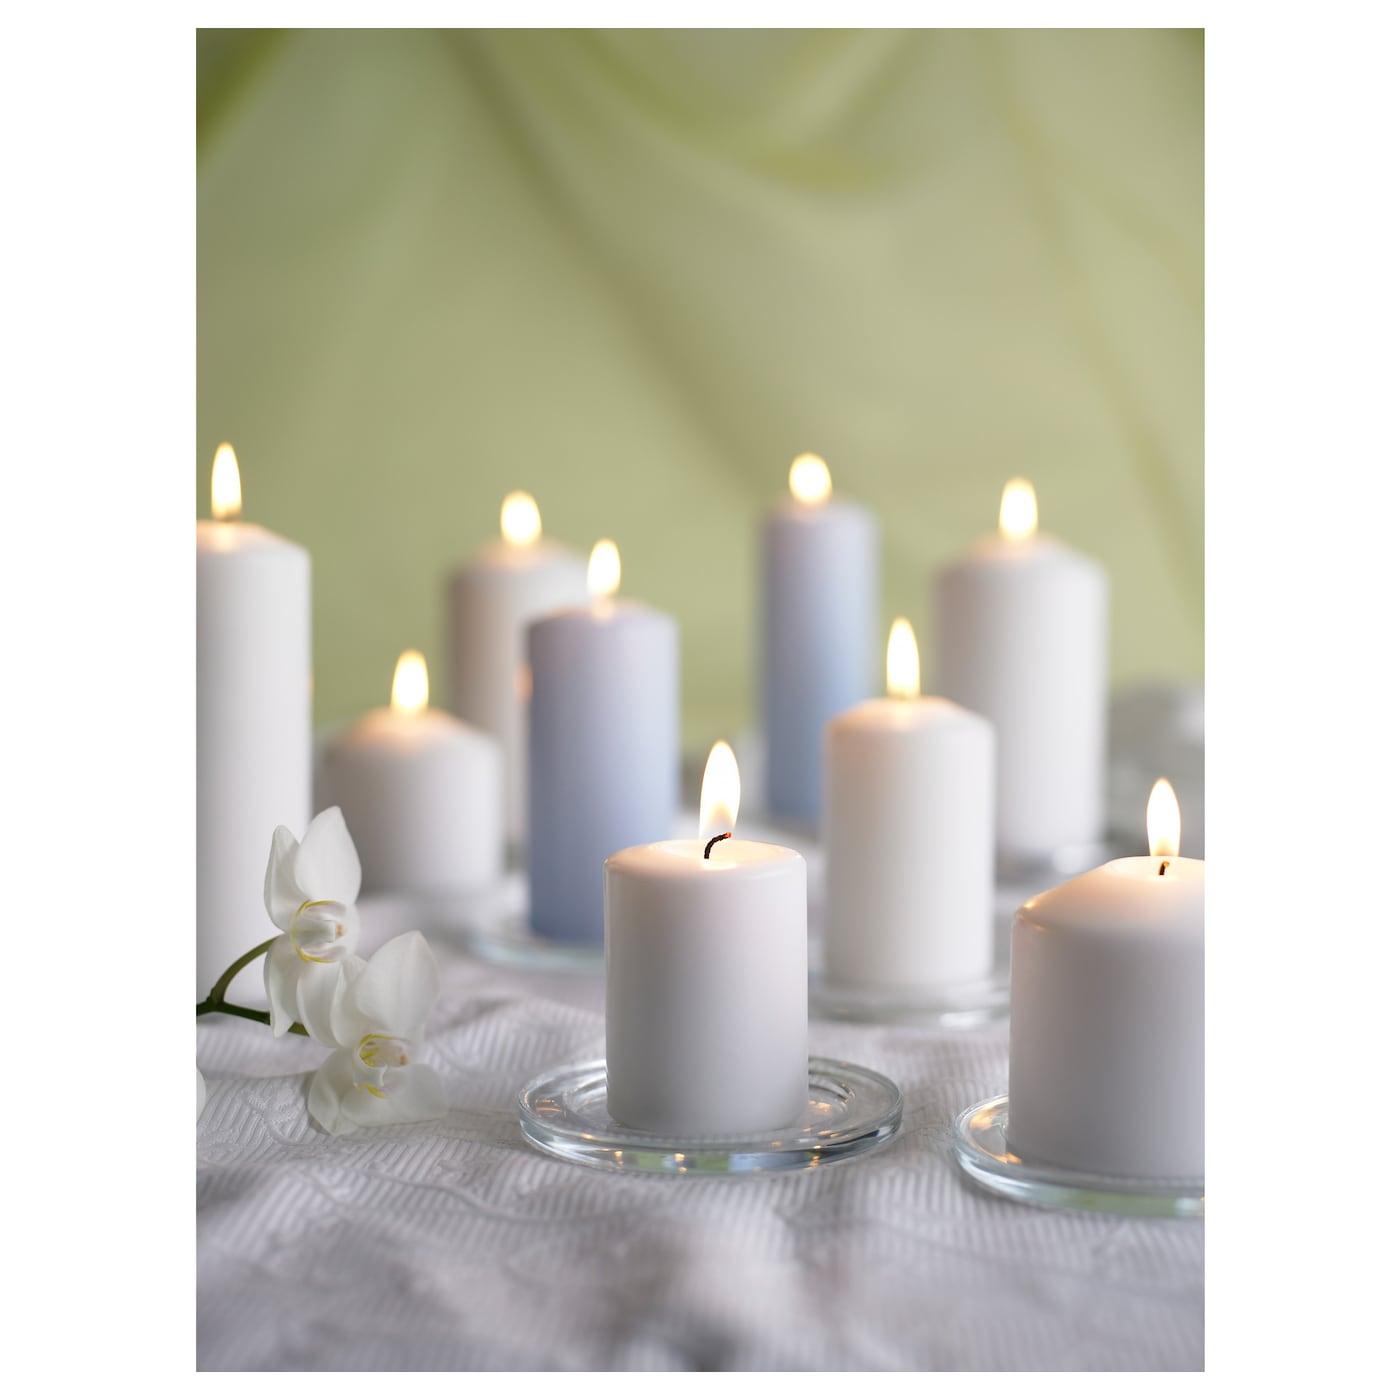 Fenomen unscented block candle set of 5 white ikea for Stufa candele ikea